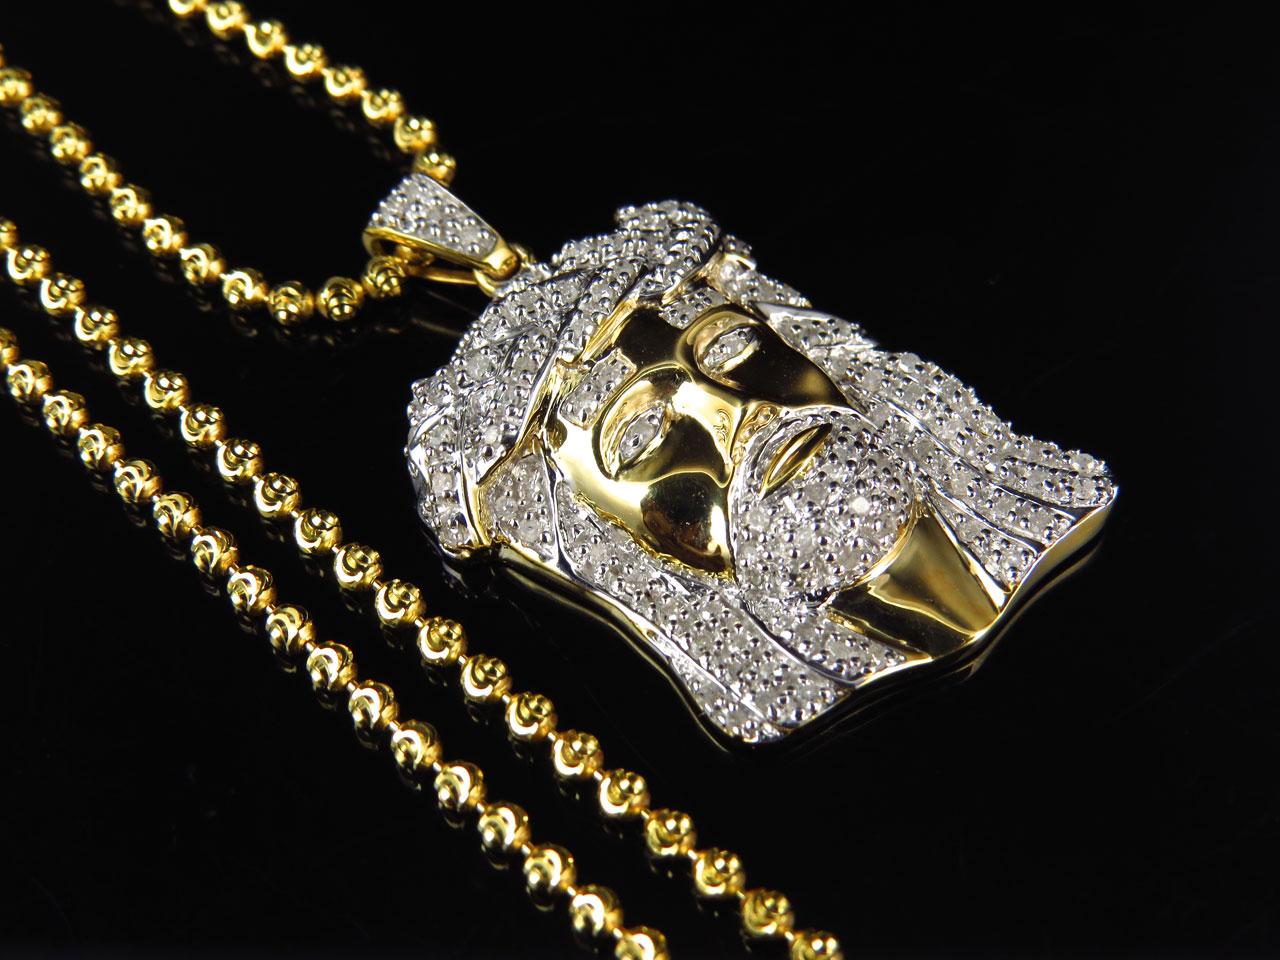 Mens 75 ct real diamond jesus head pendant in yellow gold finish mens 75 ct real diamond jesus head pendant in yellow gold finish with chain aloadofball Gallery